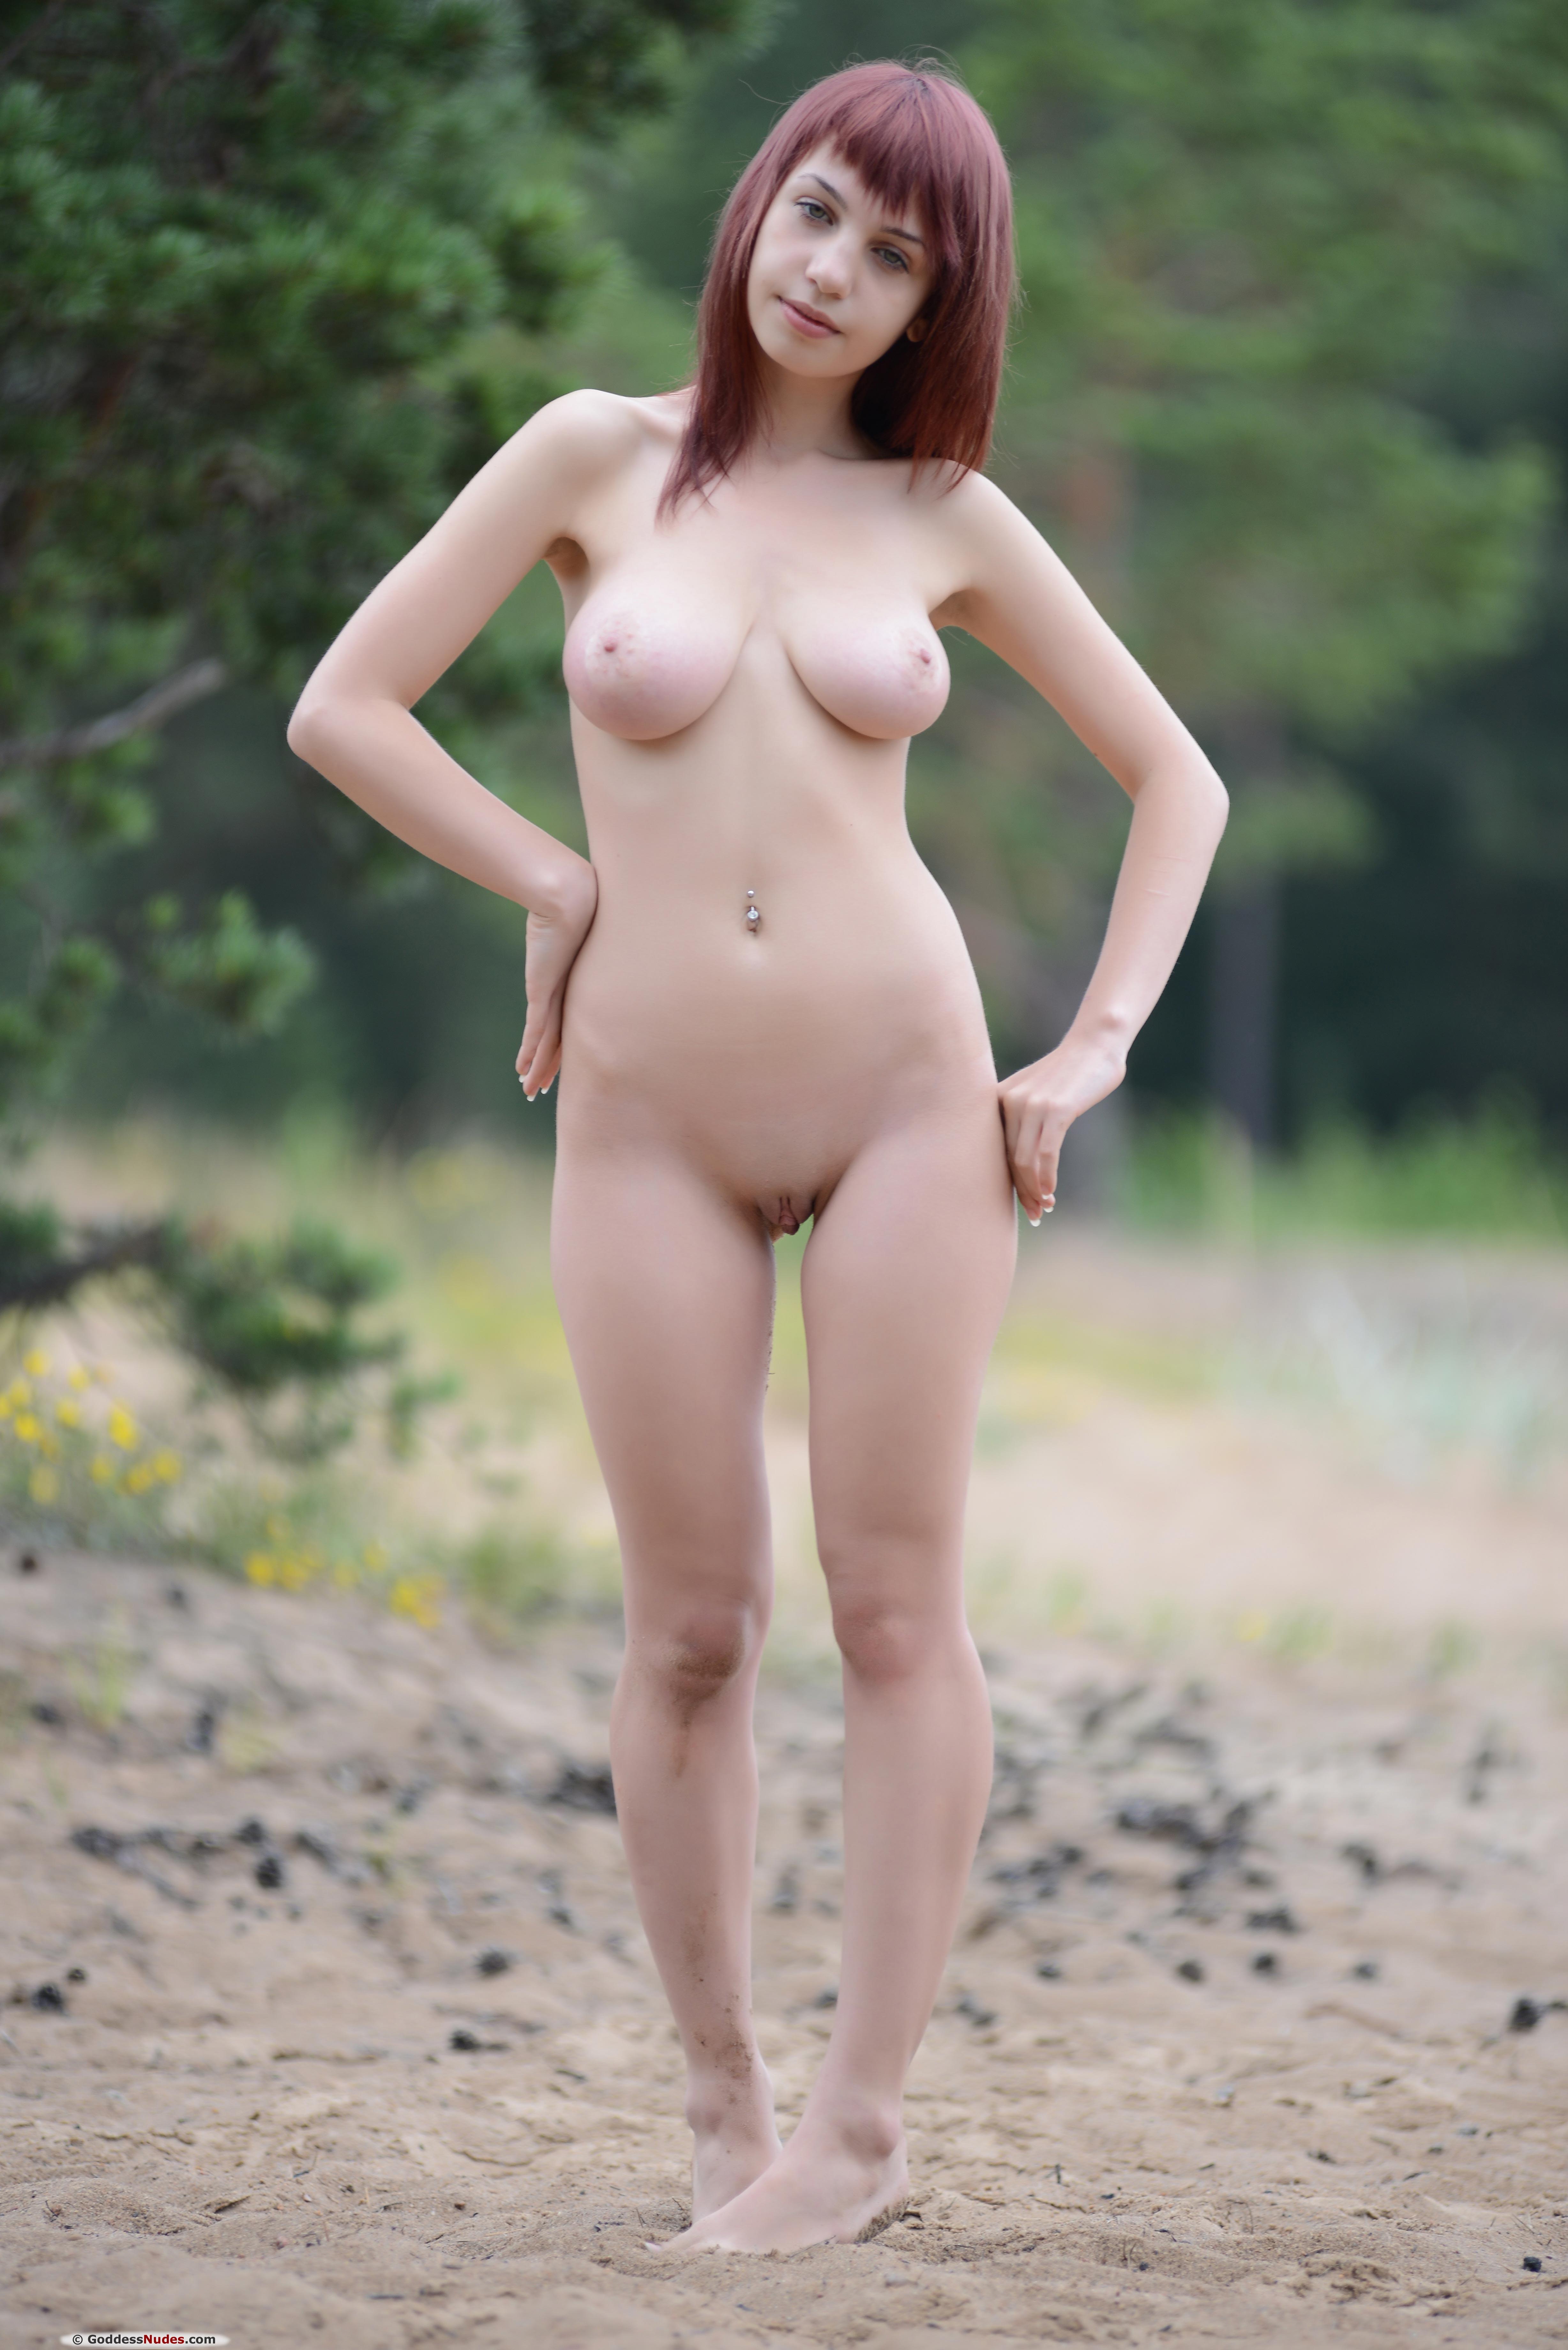 Blonde rima nude pics